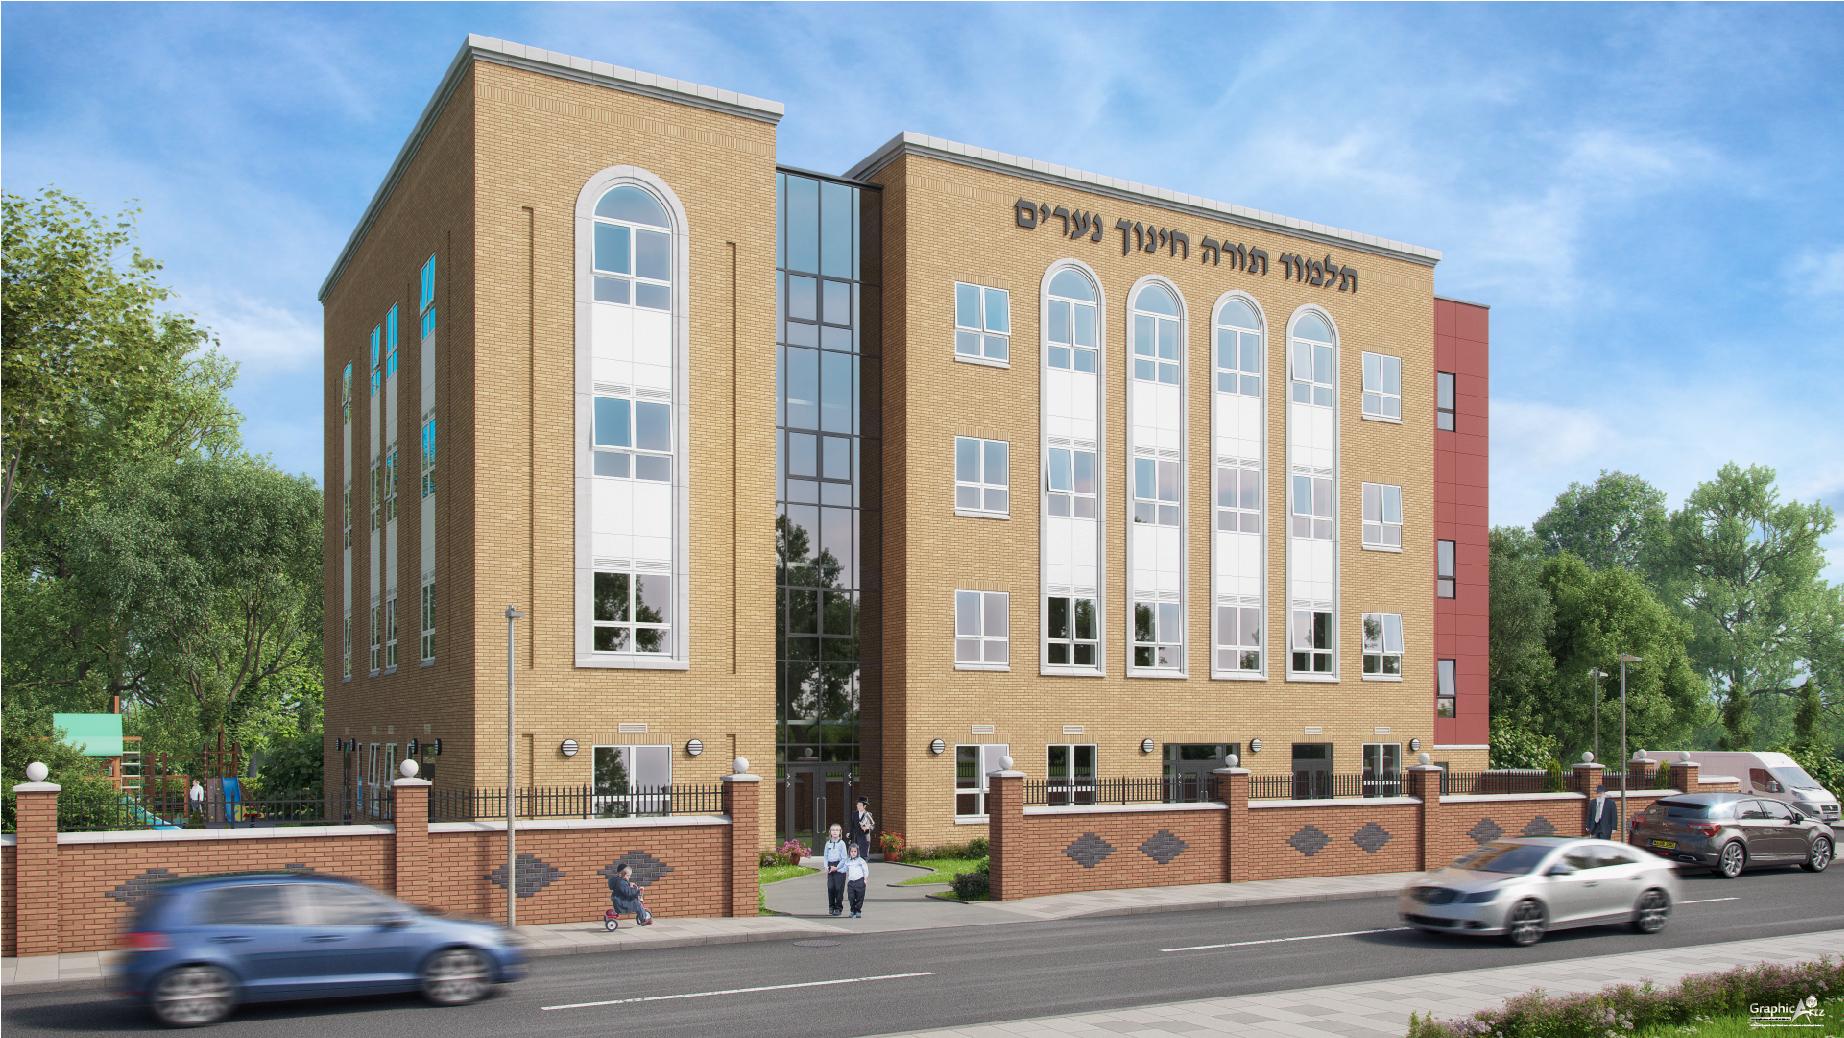 Talmud Torah Manchester CGI